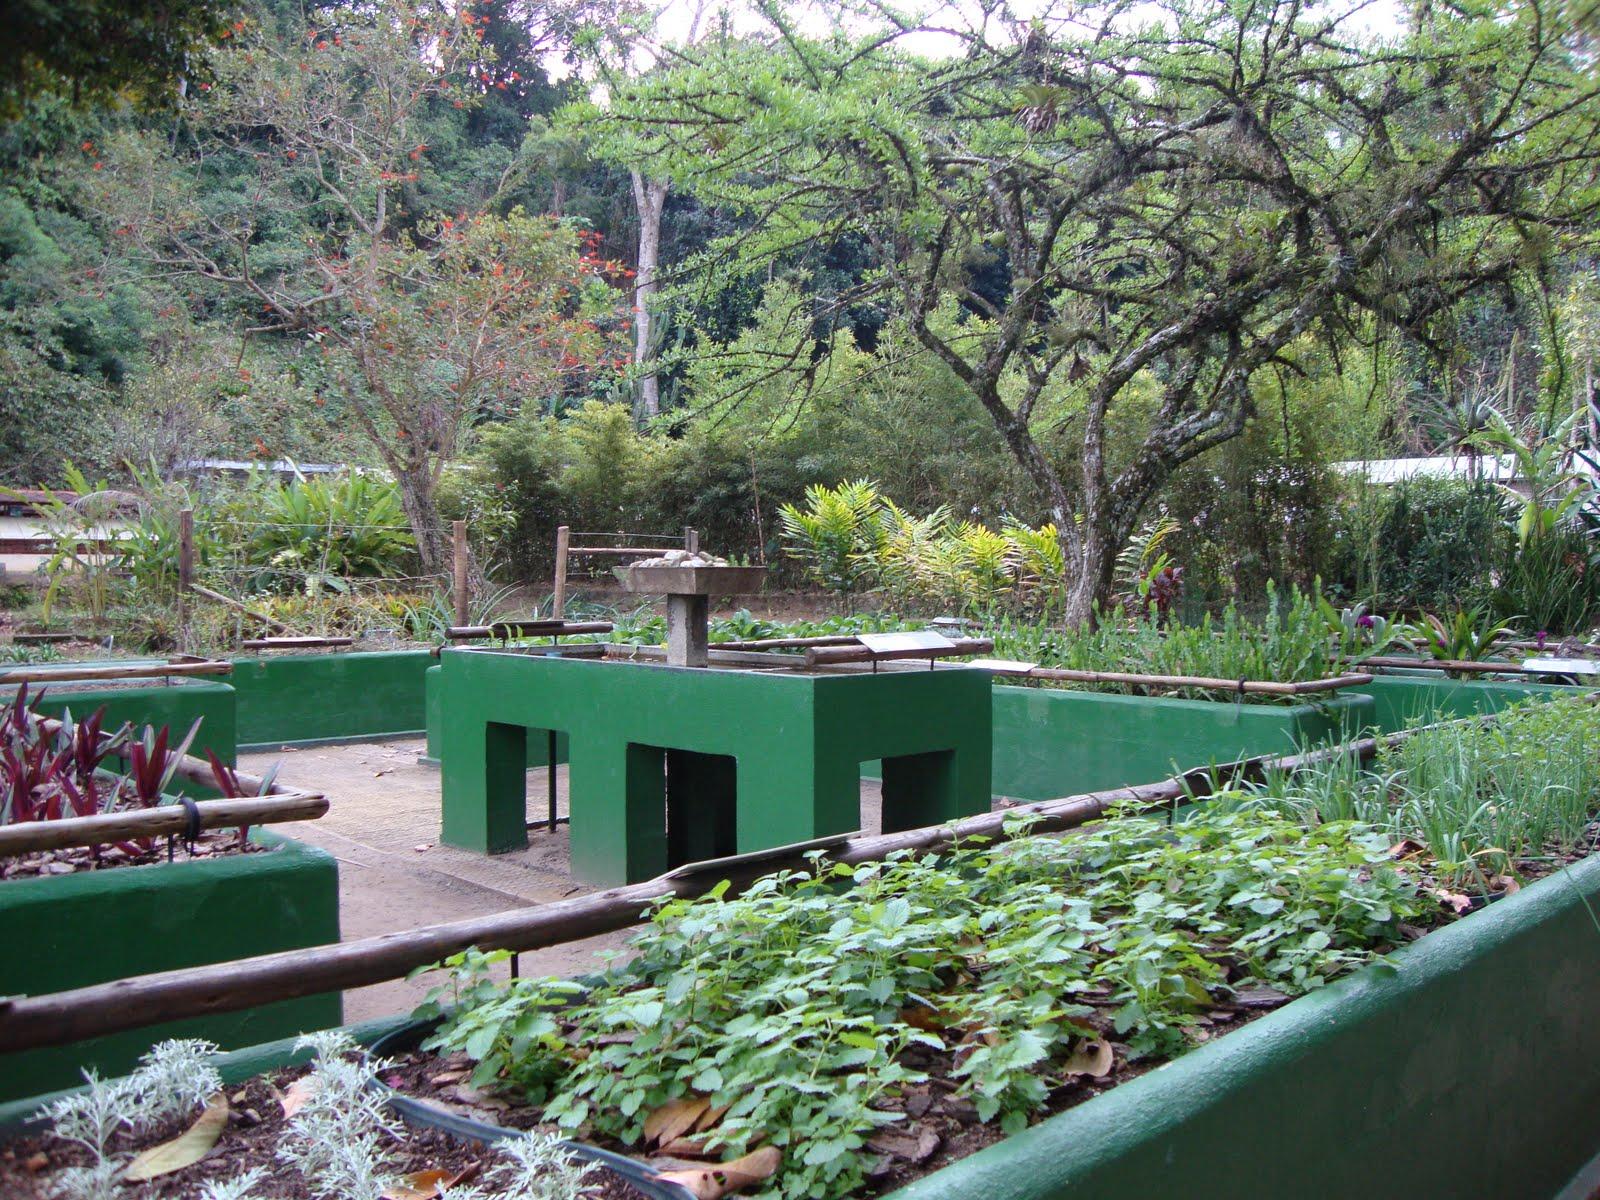 plantas jardim sensorial : plantas jardim sensorial:Jardim sensorial no Jardim Botânico do Rio